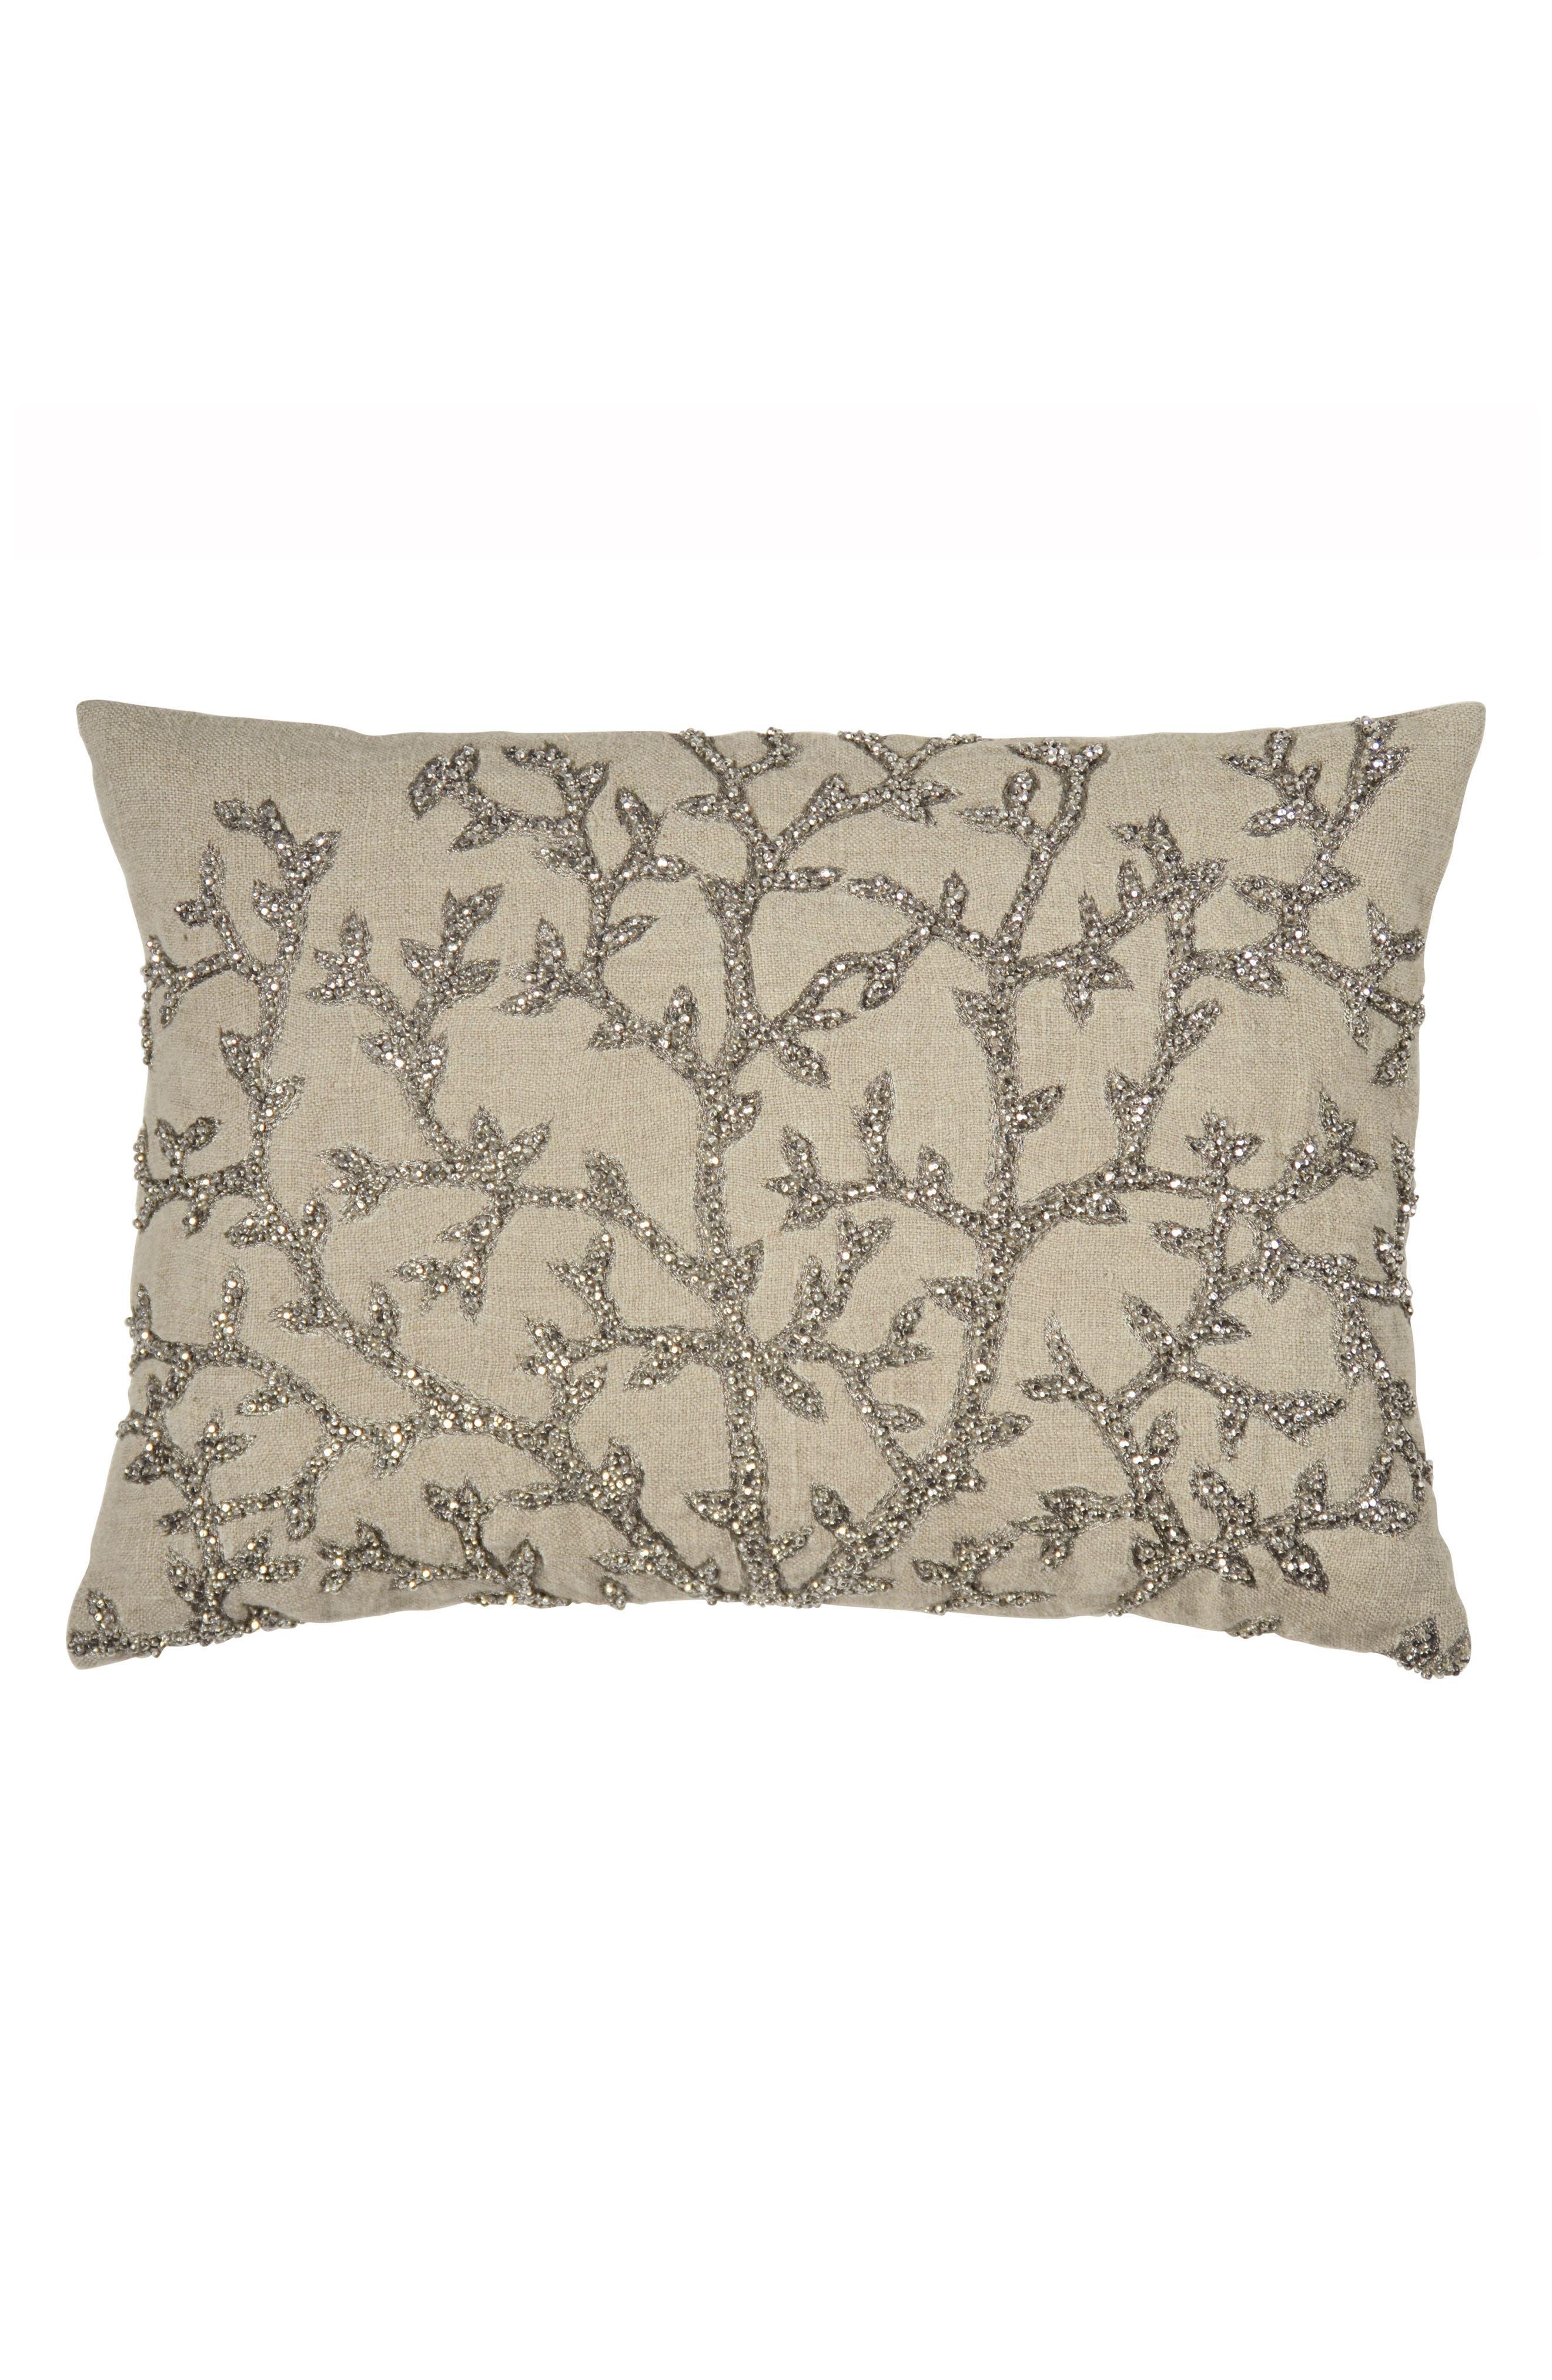 Main Image - Michael Aram Tree of Life Beaded Accent Pillow